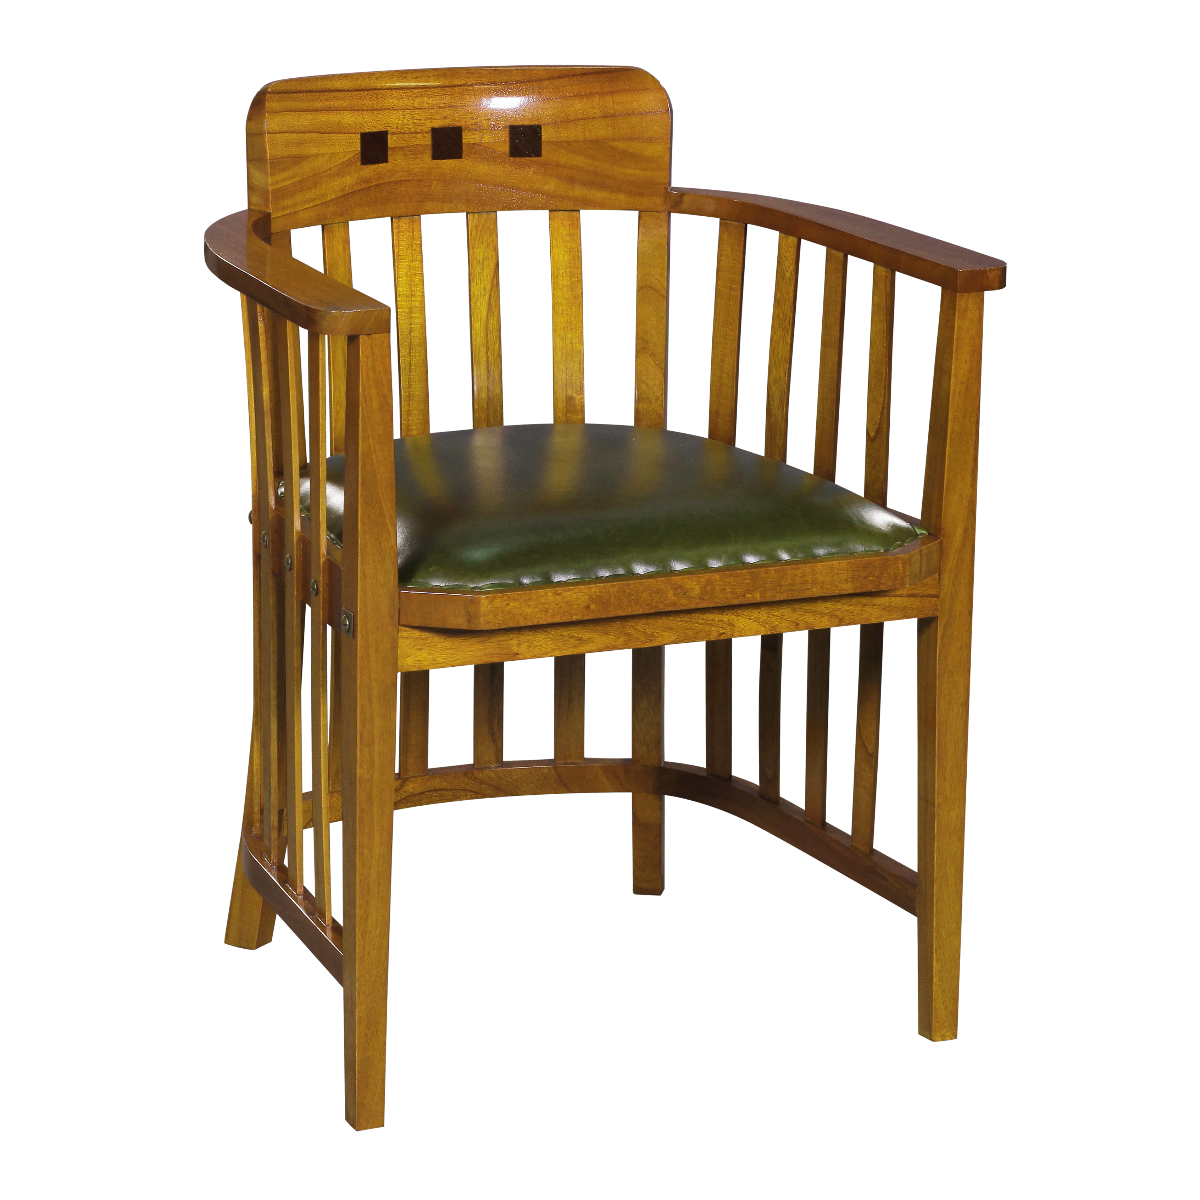 31912 - office chair myl agrn sfd - 2 1